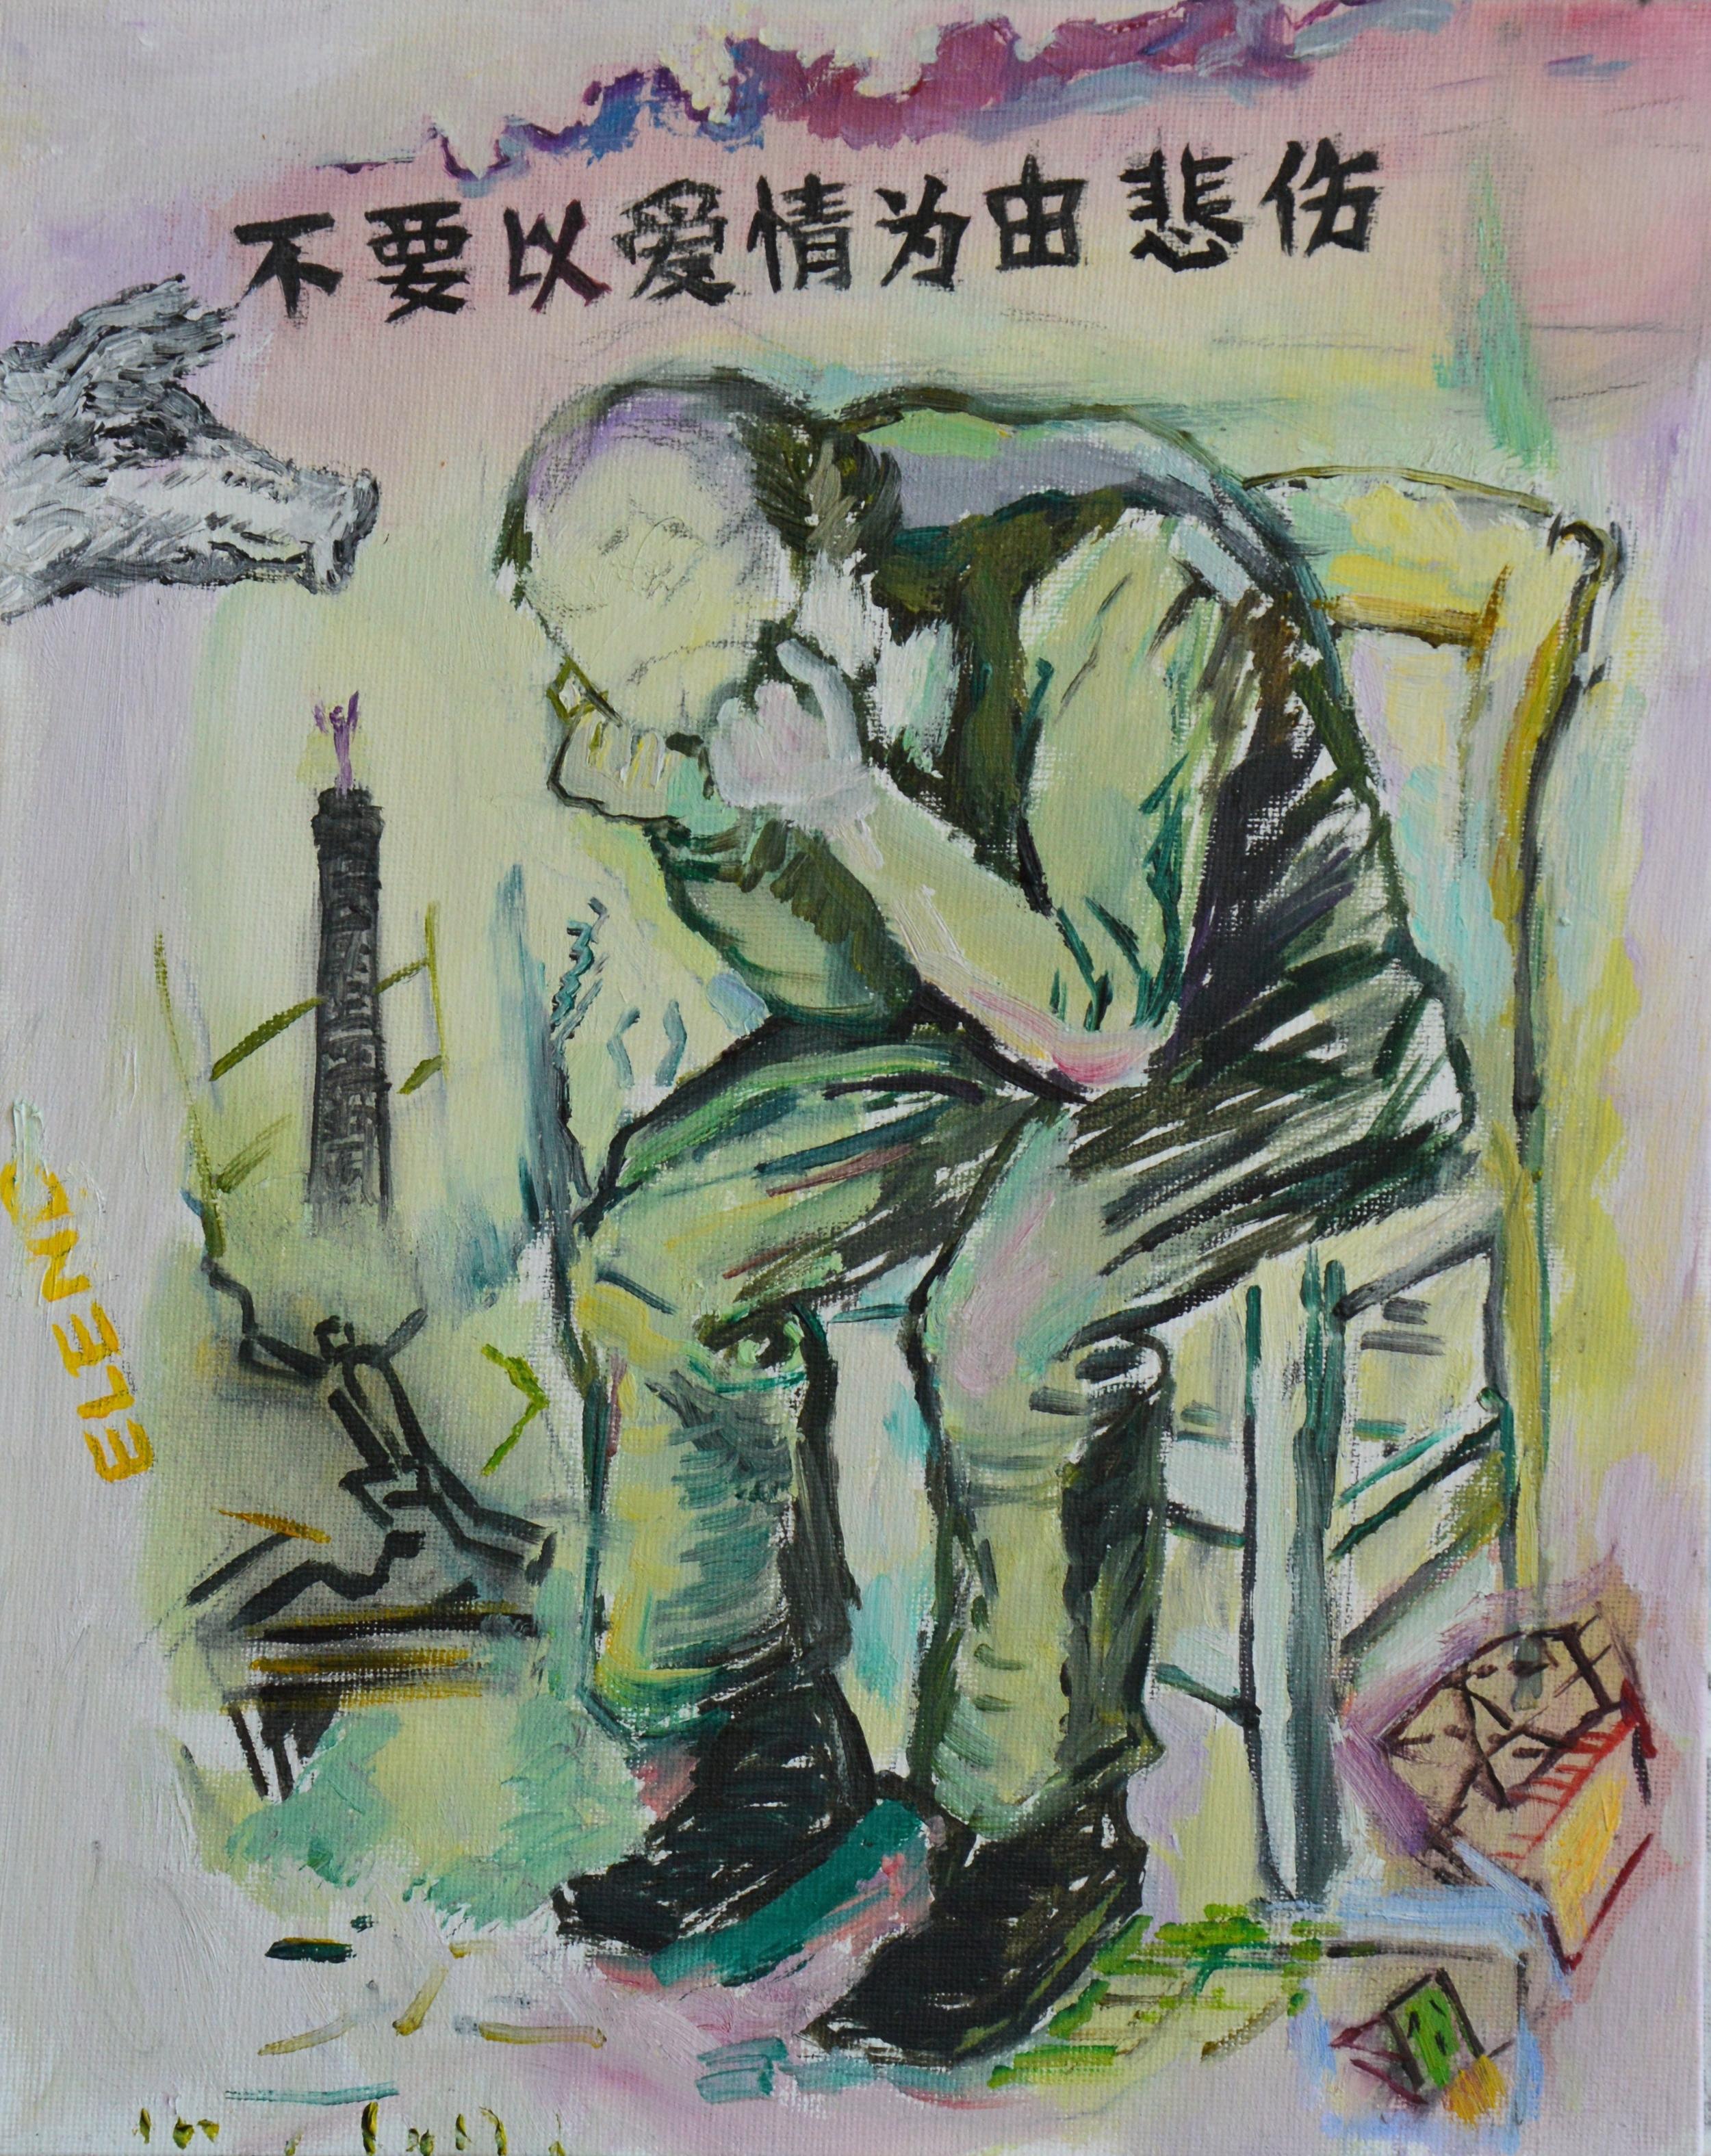 Sorrow , 2014 Oil on board 30 x 24 cm